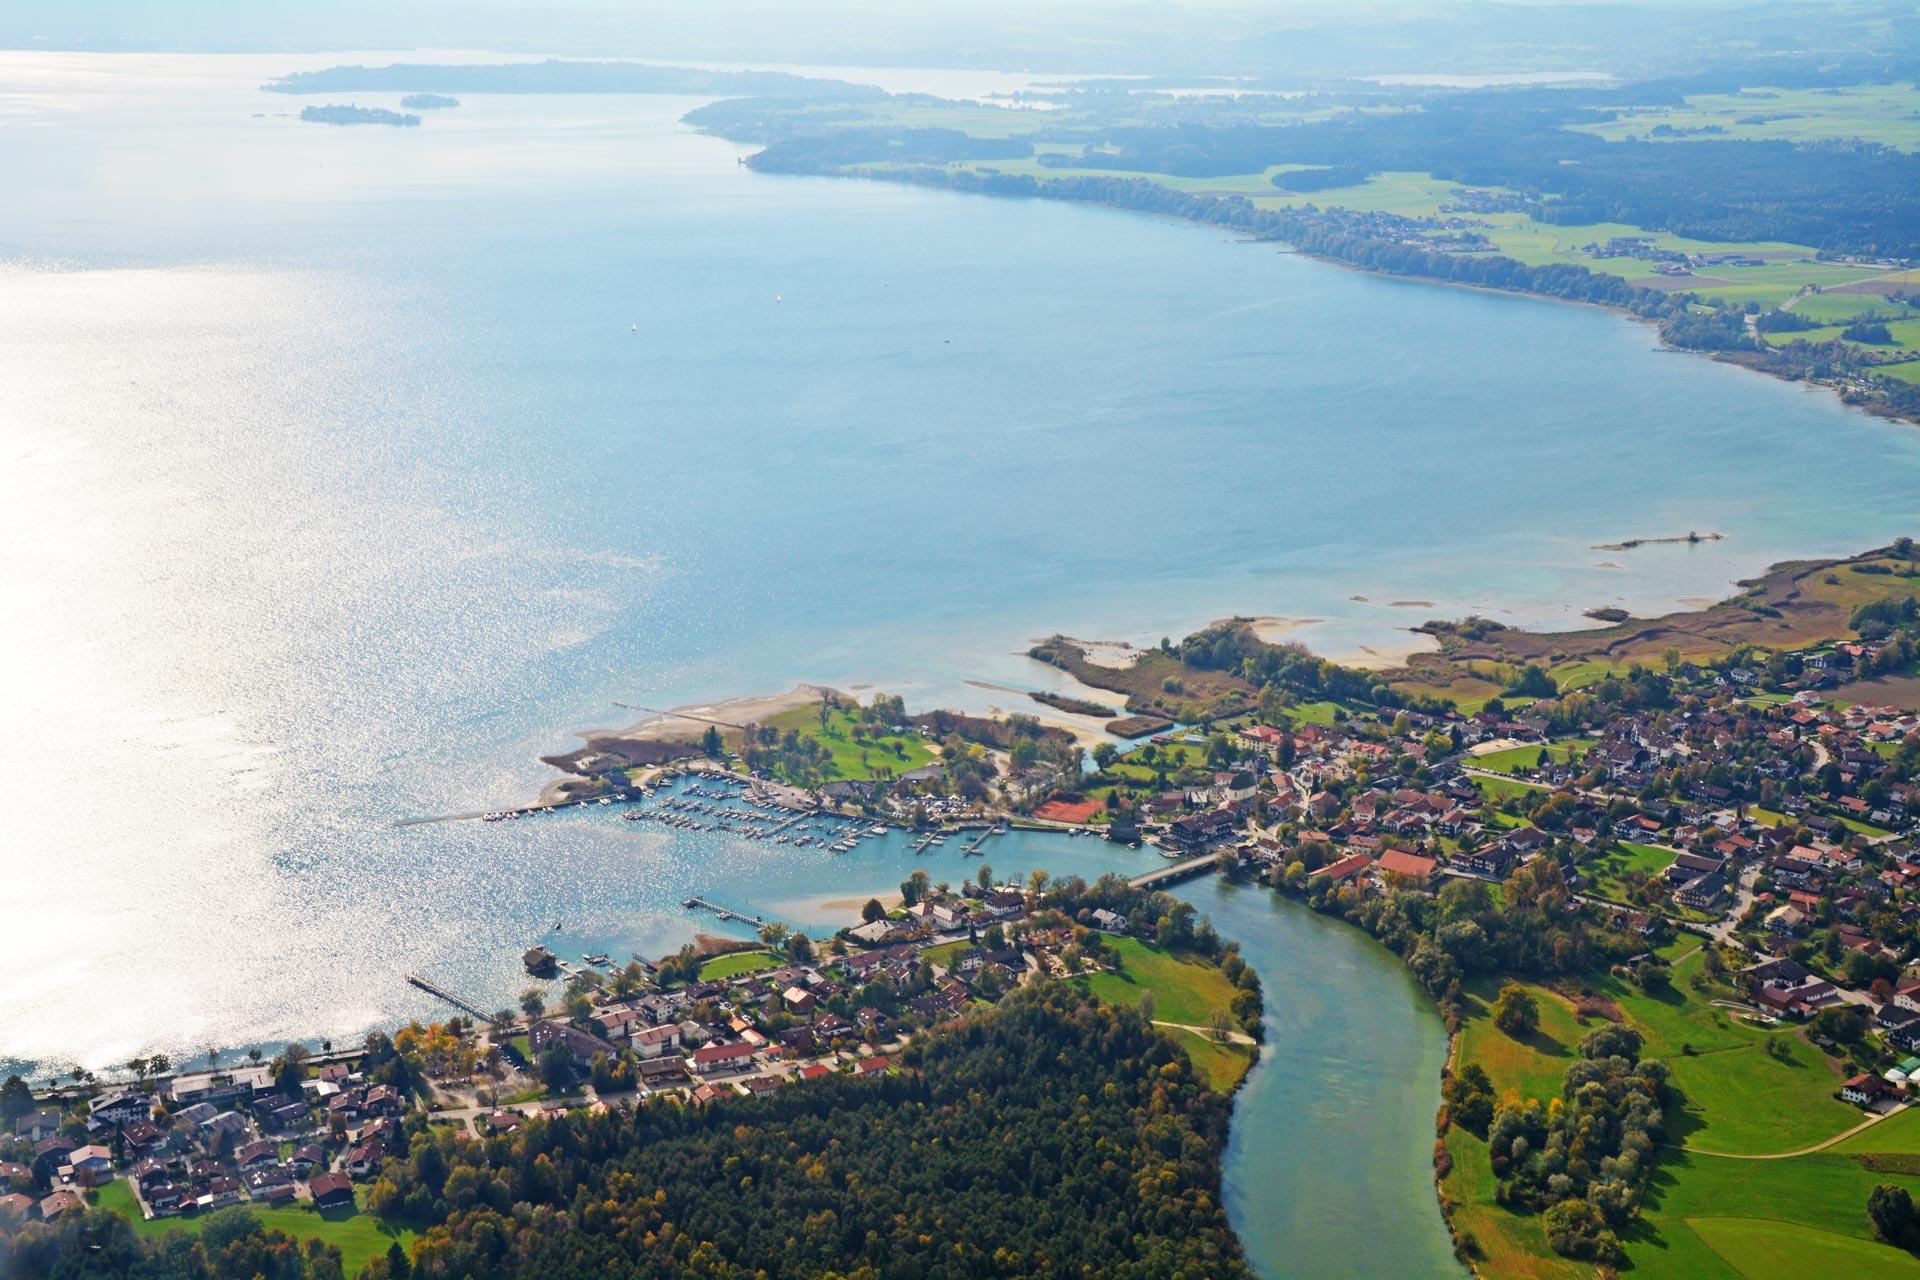 Engstelle der Tiroler Achen